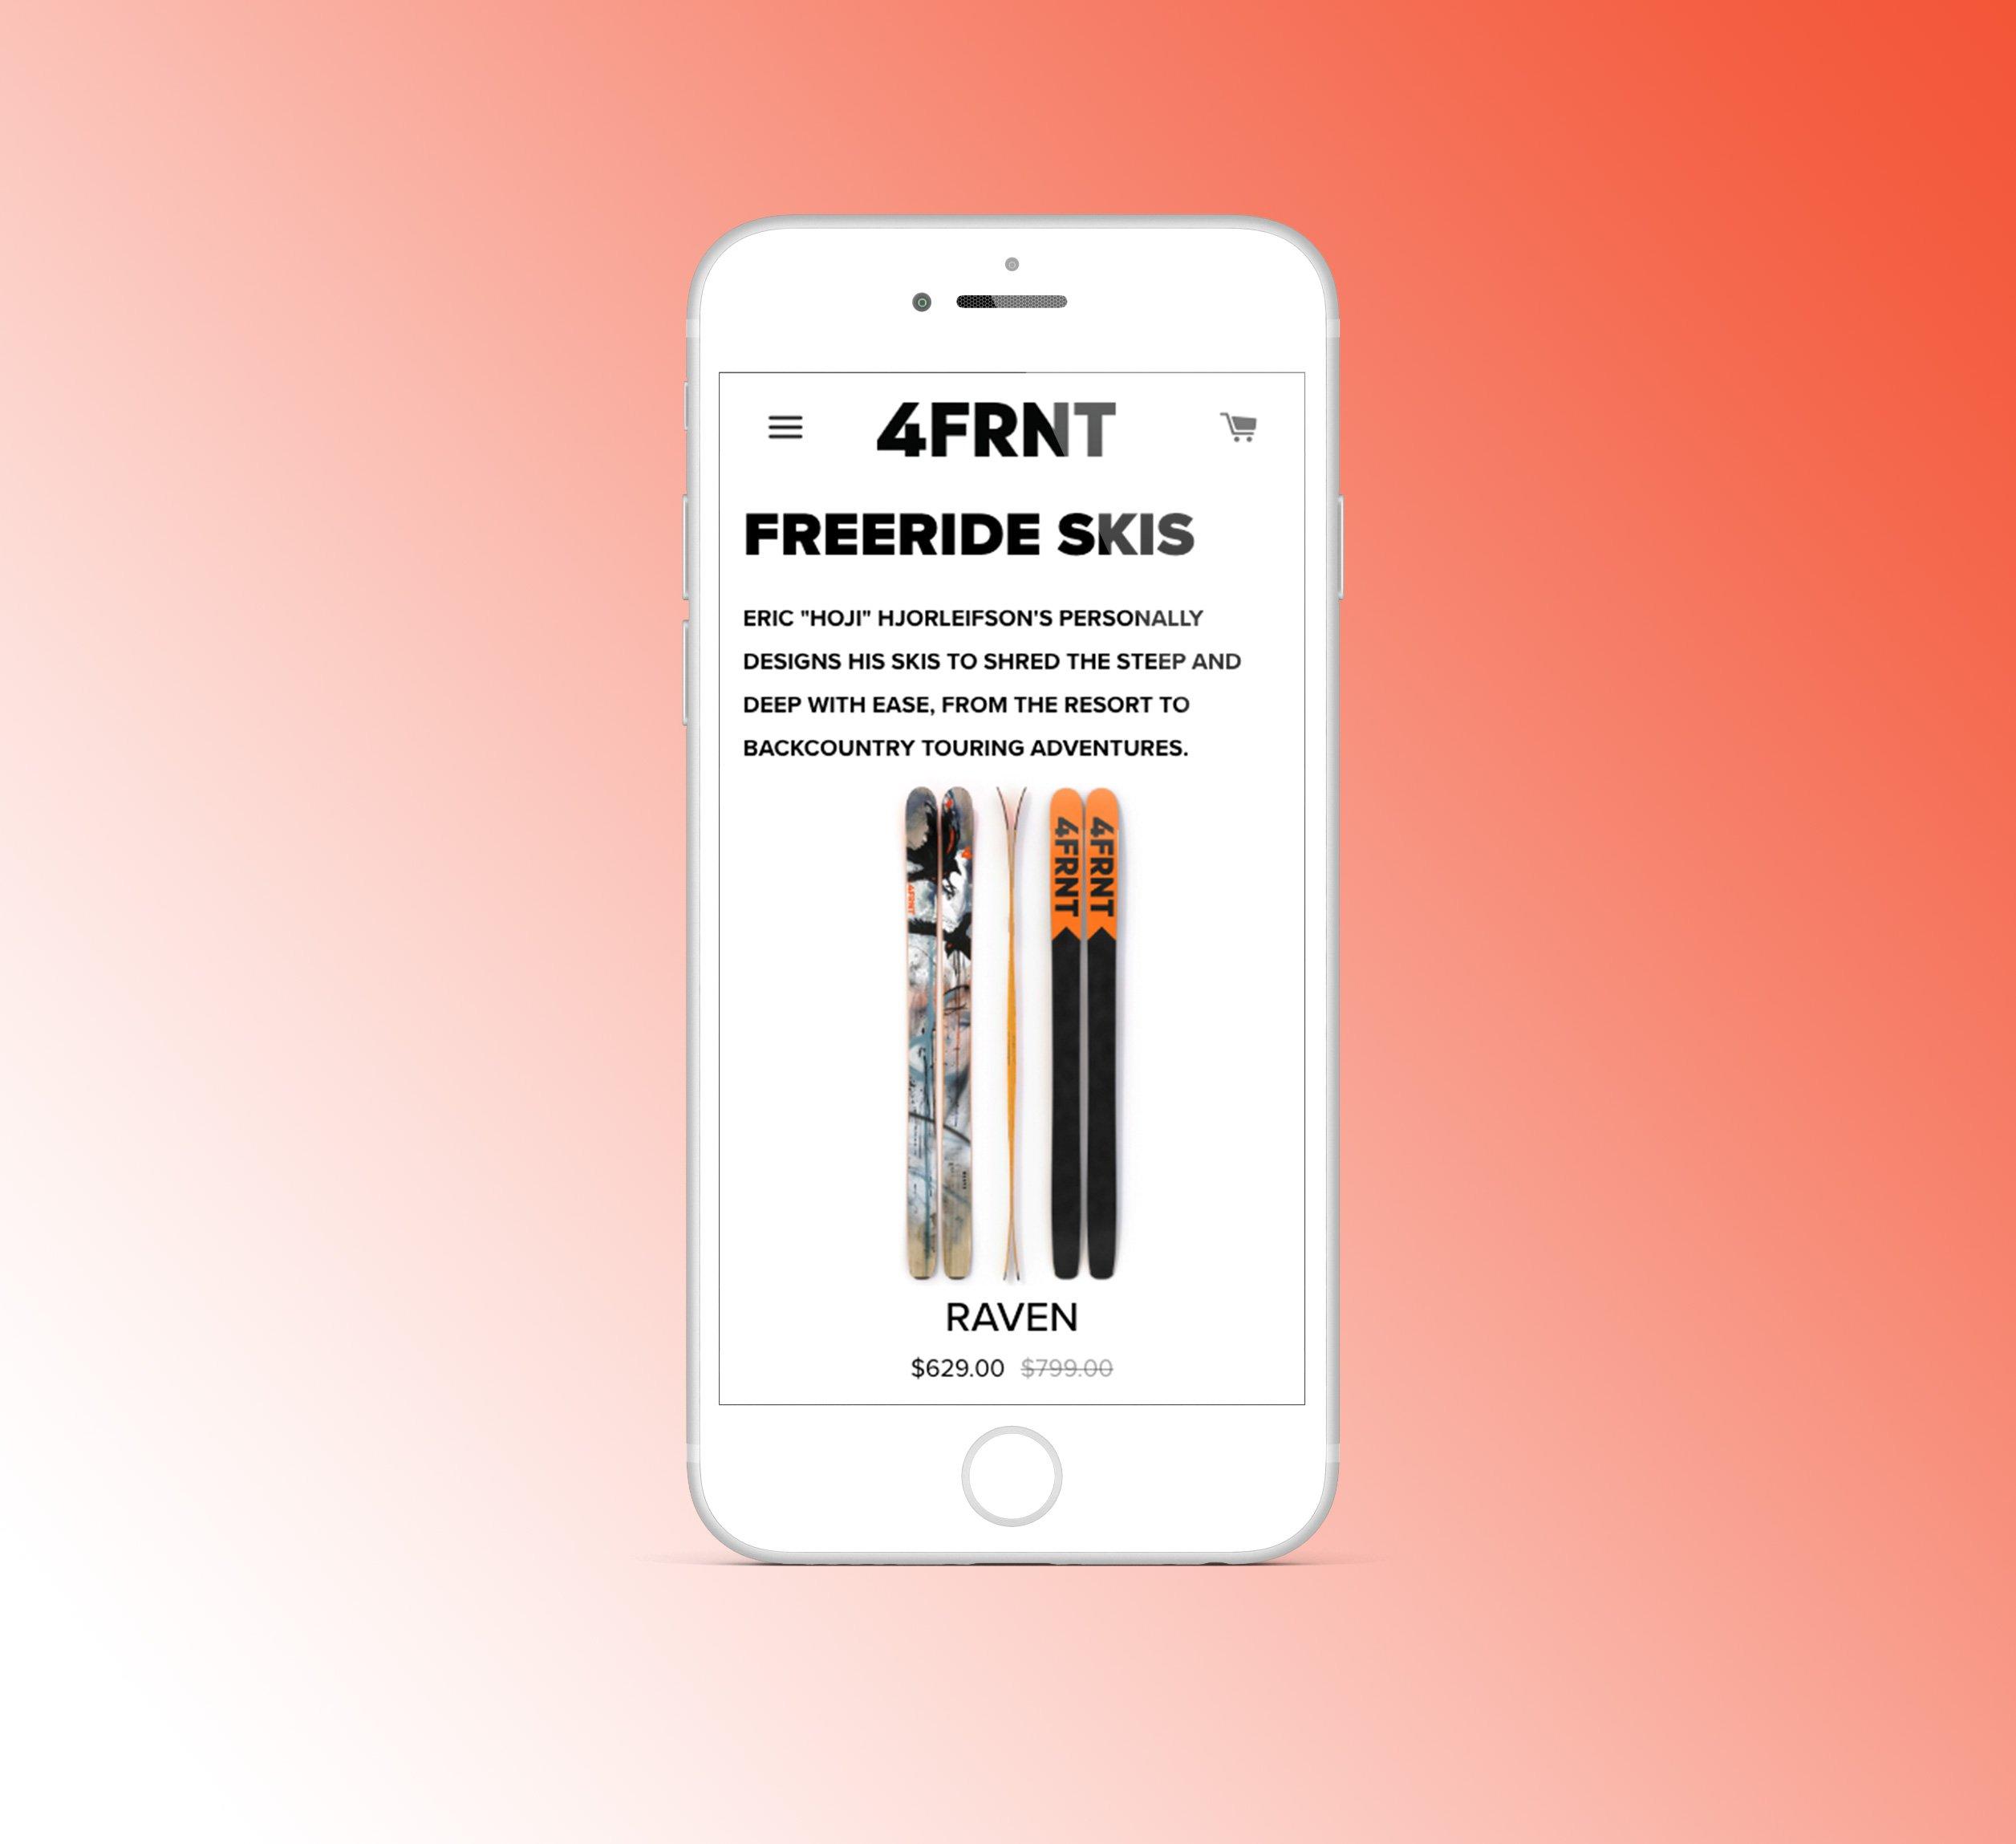 4frnt website on iphone